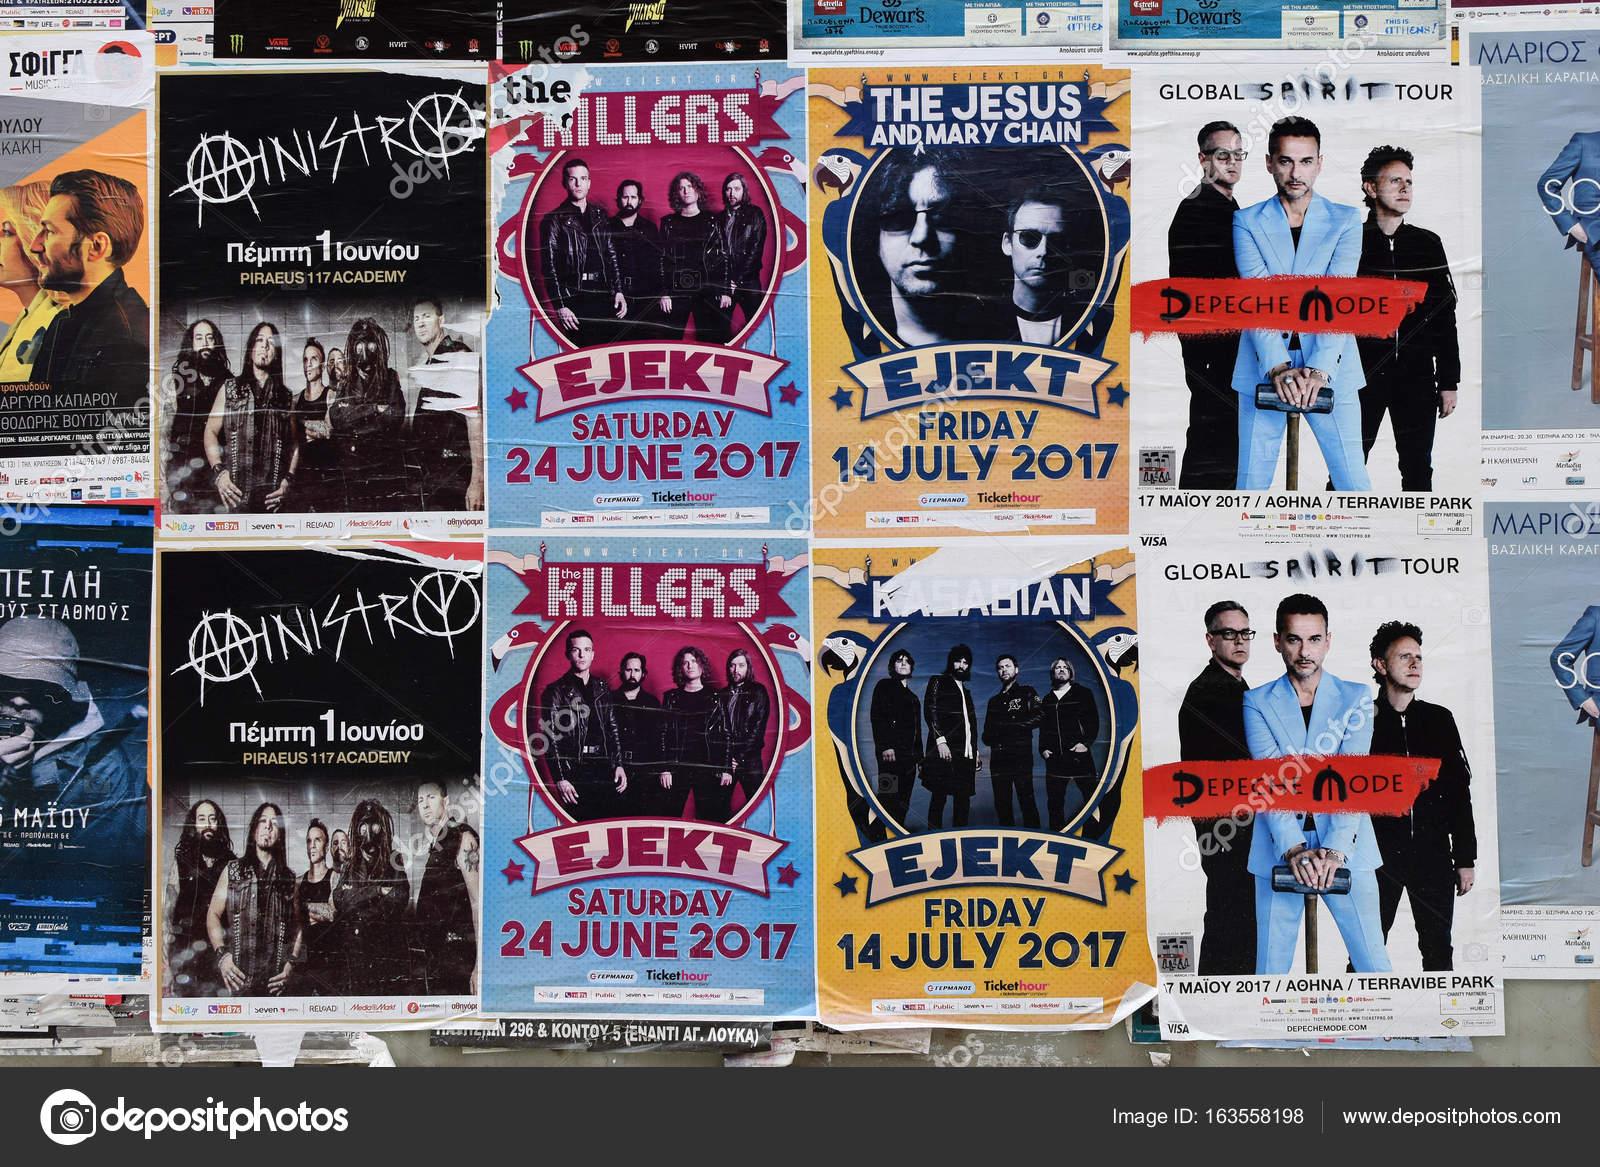 Concert Posters Pop Rock Music Stock Editorial Photo C Sirylok